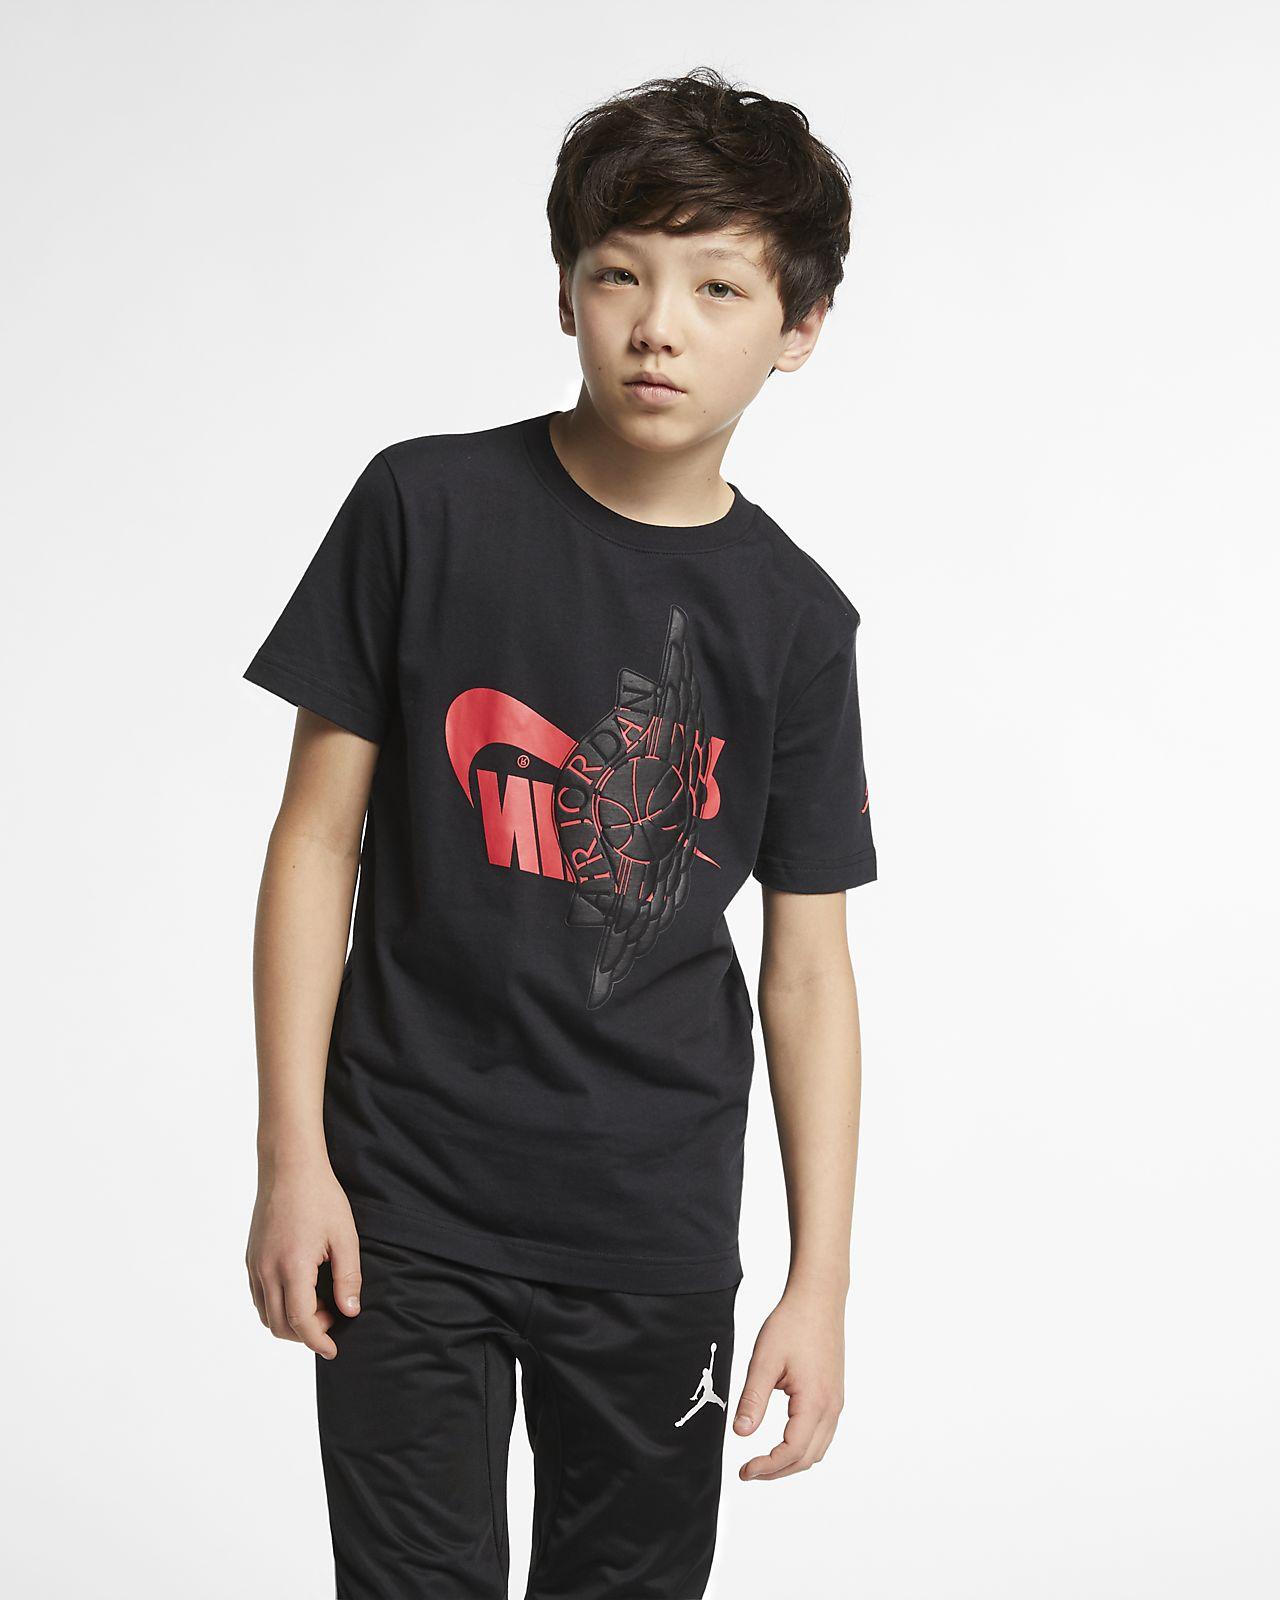 1a076bf22c6 Jordan Sportswear Wings Older Kids' (Boys') T-Shirt. Nike.com GB